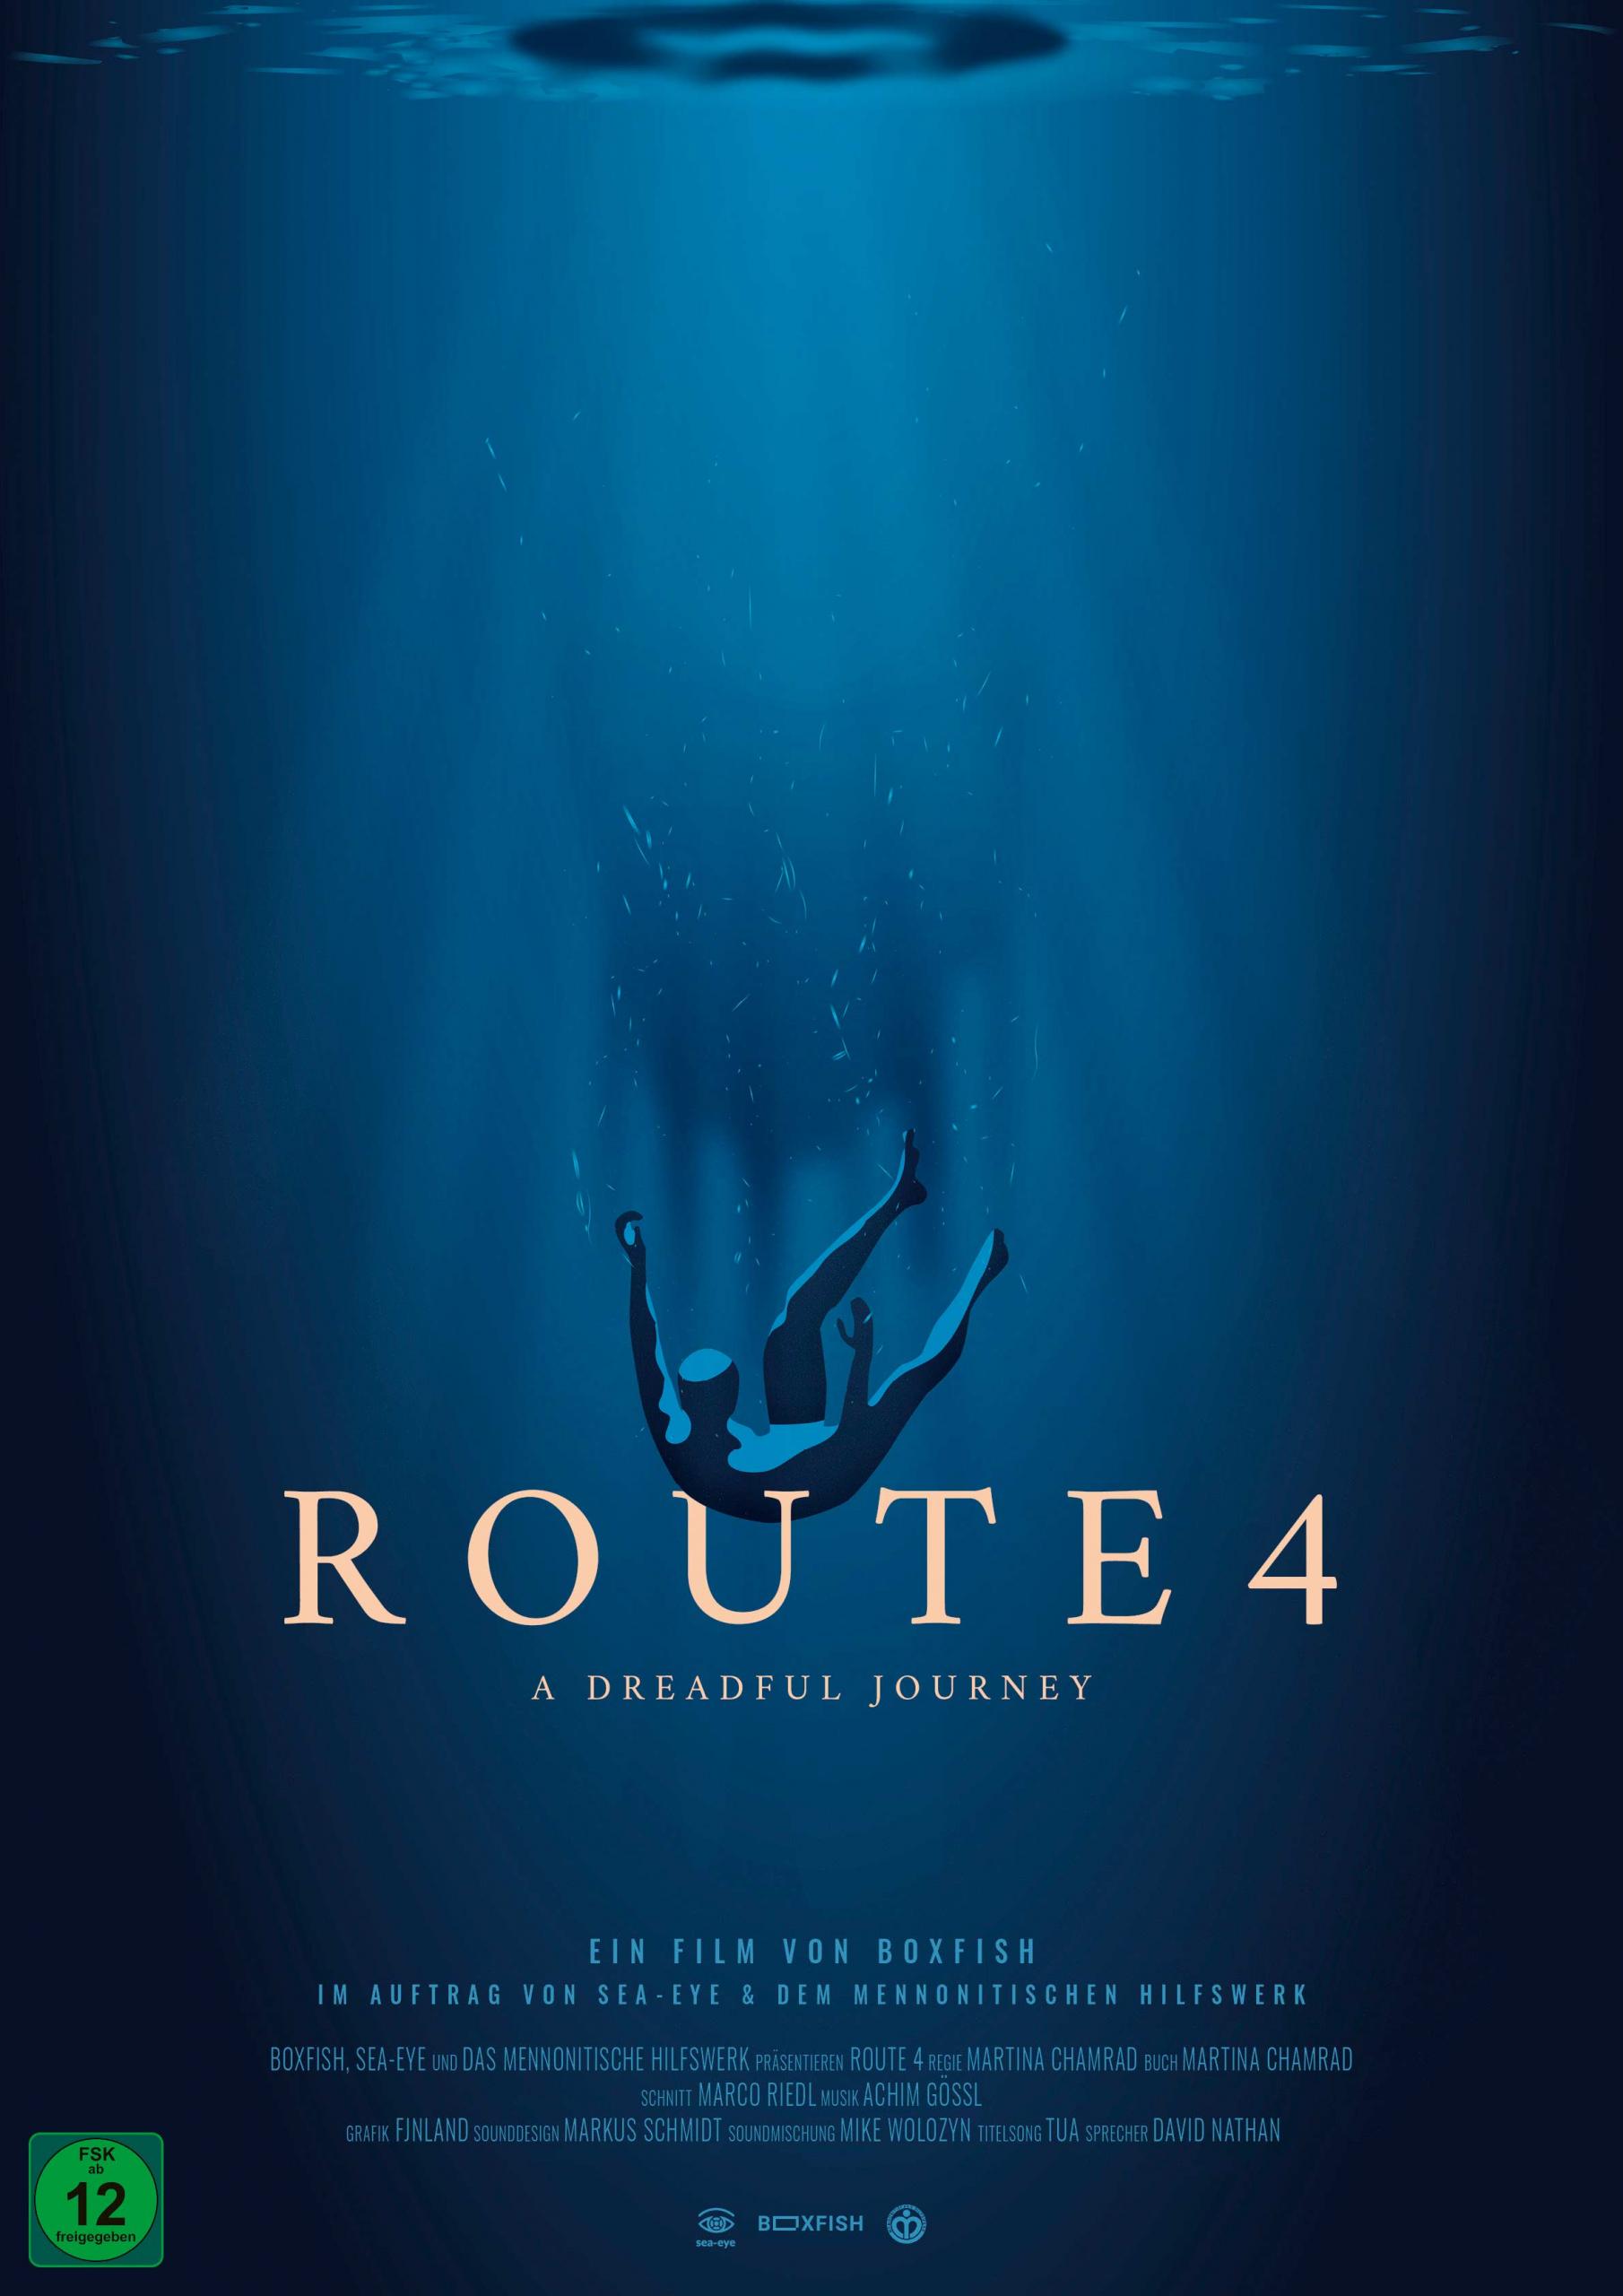 Filmplakat: Route 4 - A Dreadful Journey